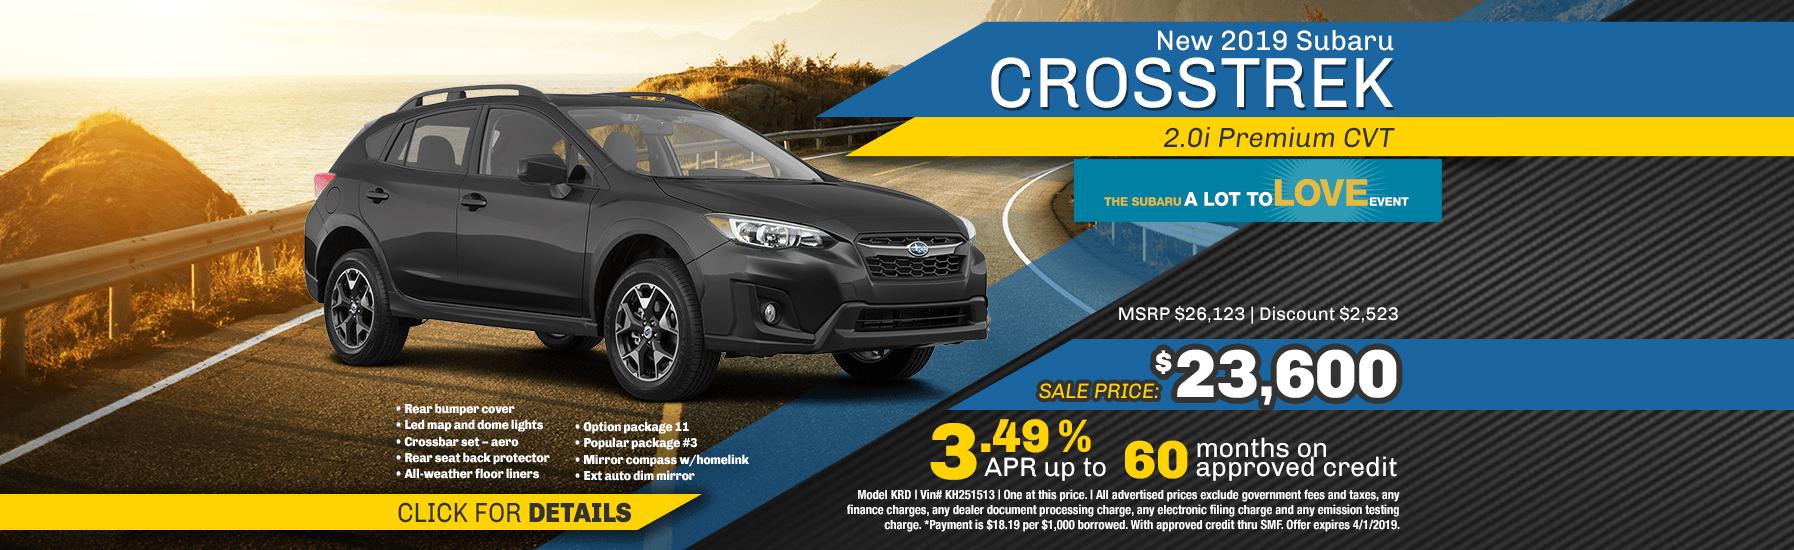 New 2019 Subaru Crosstrek 2.0i Premium CVT special purchase & finance savings at Carlsen Subaru serving San Francisco, CA